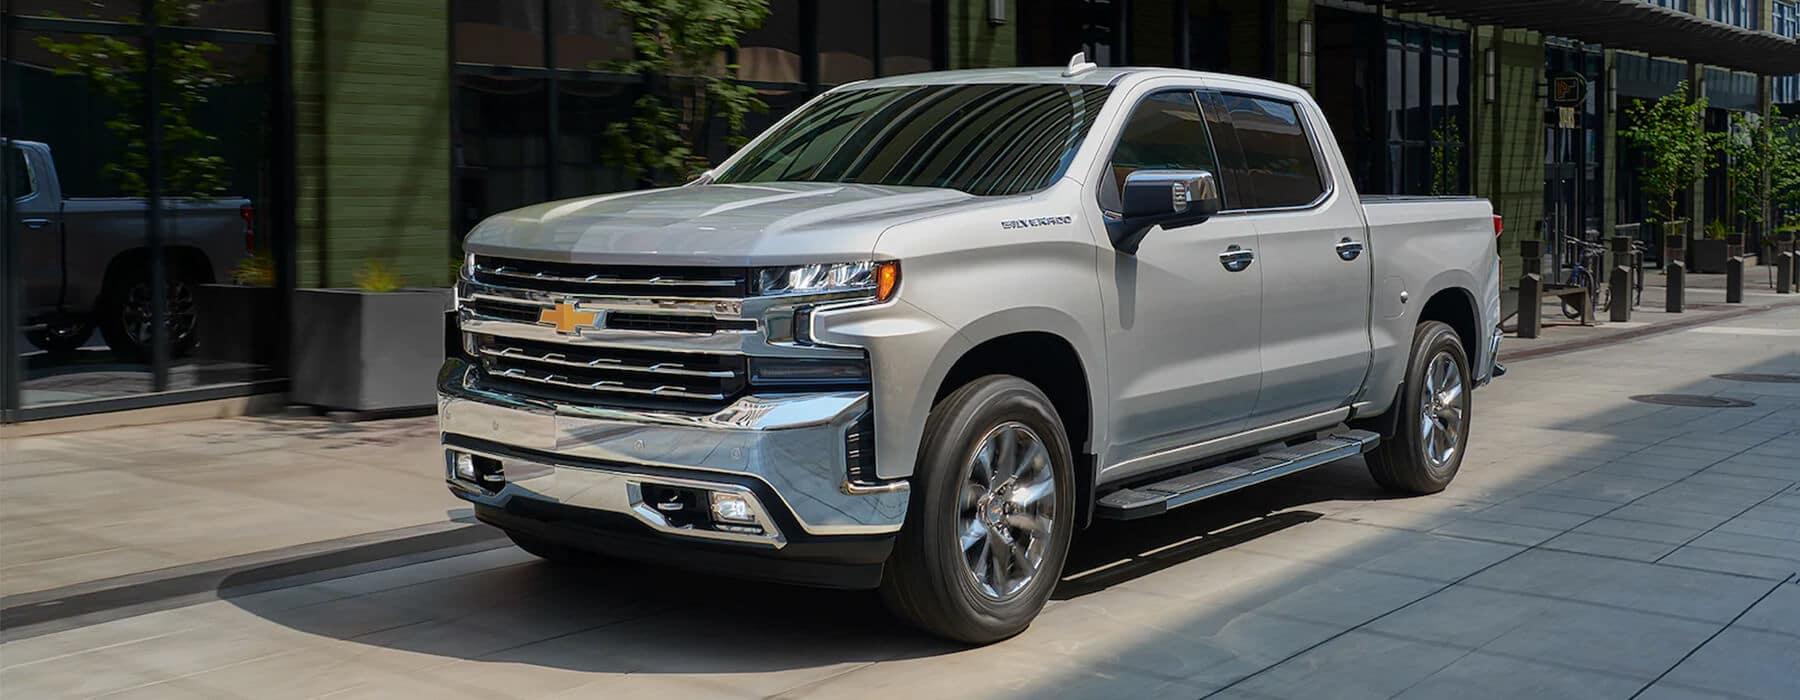 Chevrolet Dealership Near Sioux Falls Truck Slider